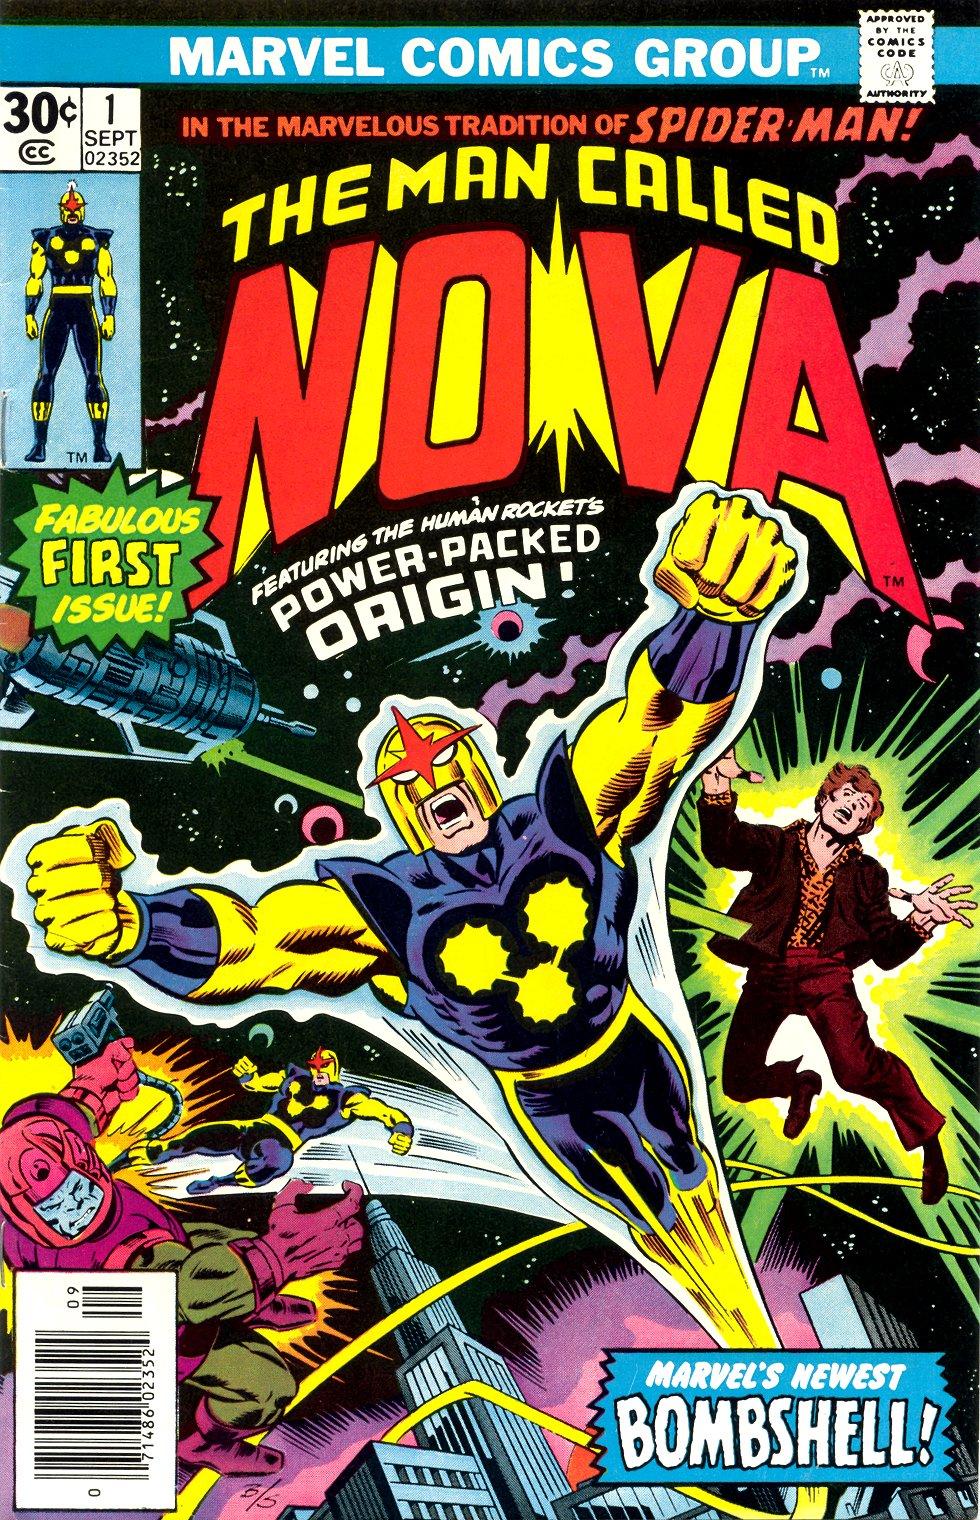 Nova (1976) 1 Page 1